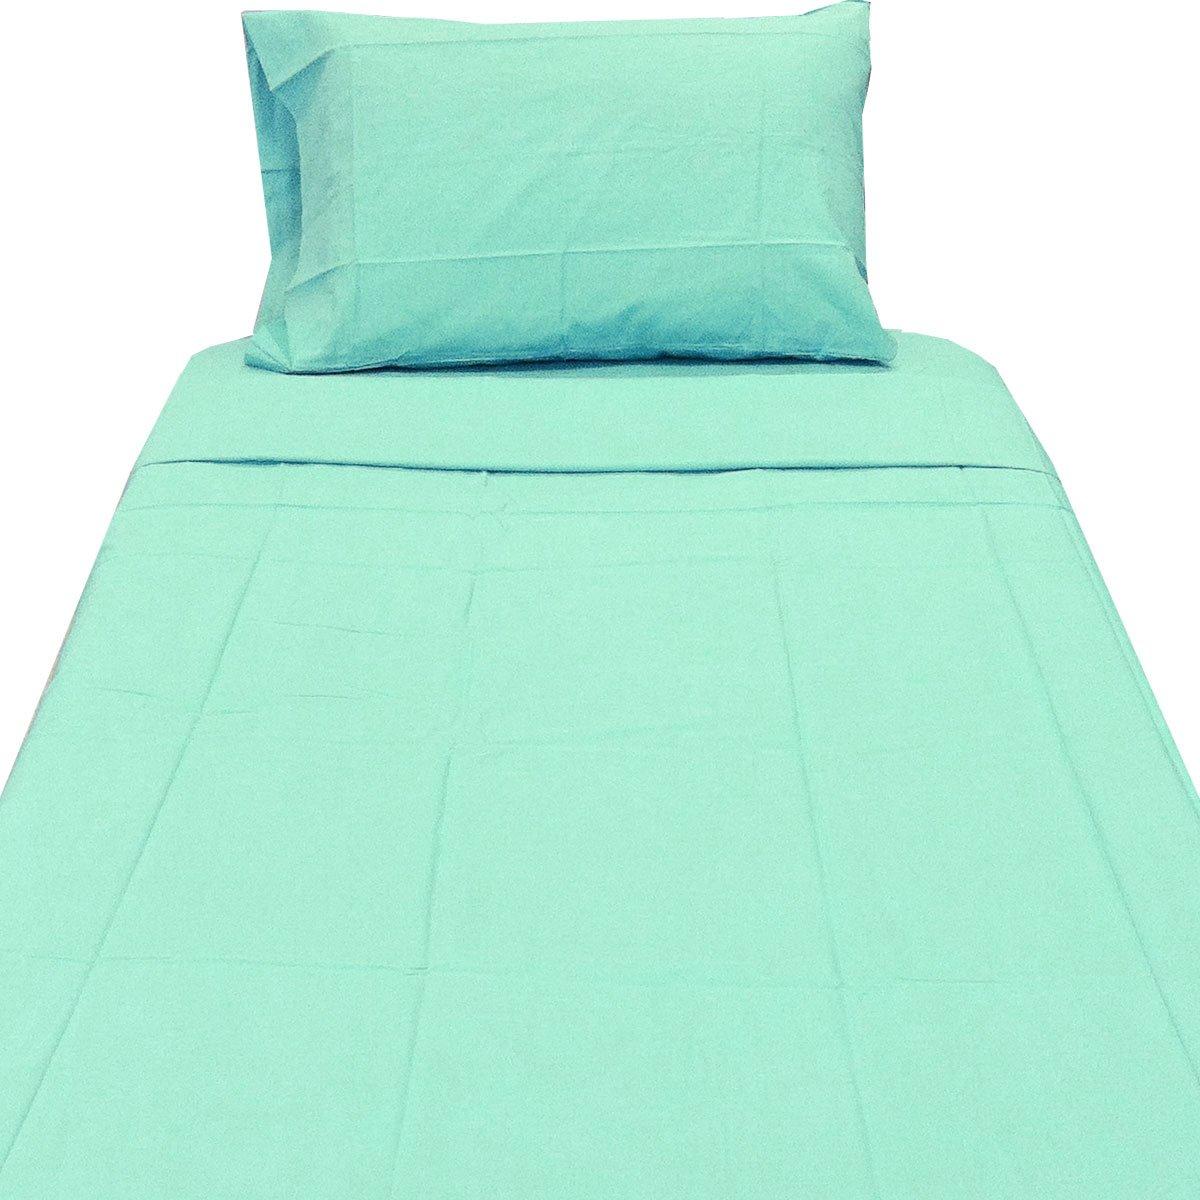 Light blue bedding - Amazon Com Light Turquoise Full Sheet Set Blue Bedding Home Kitchen